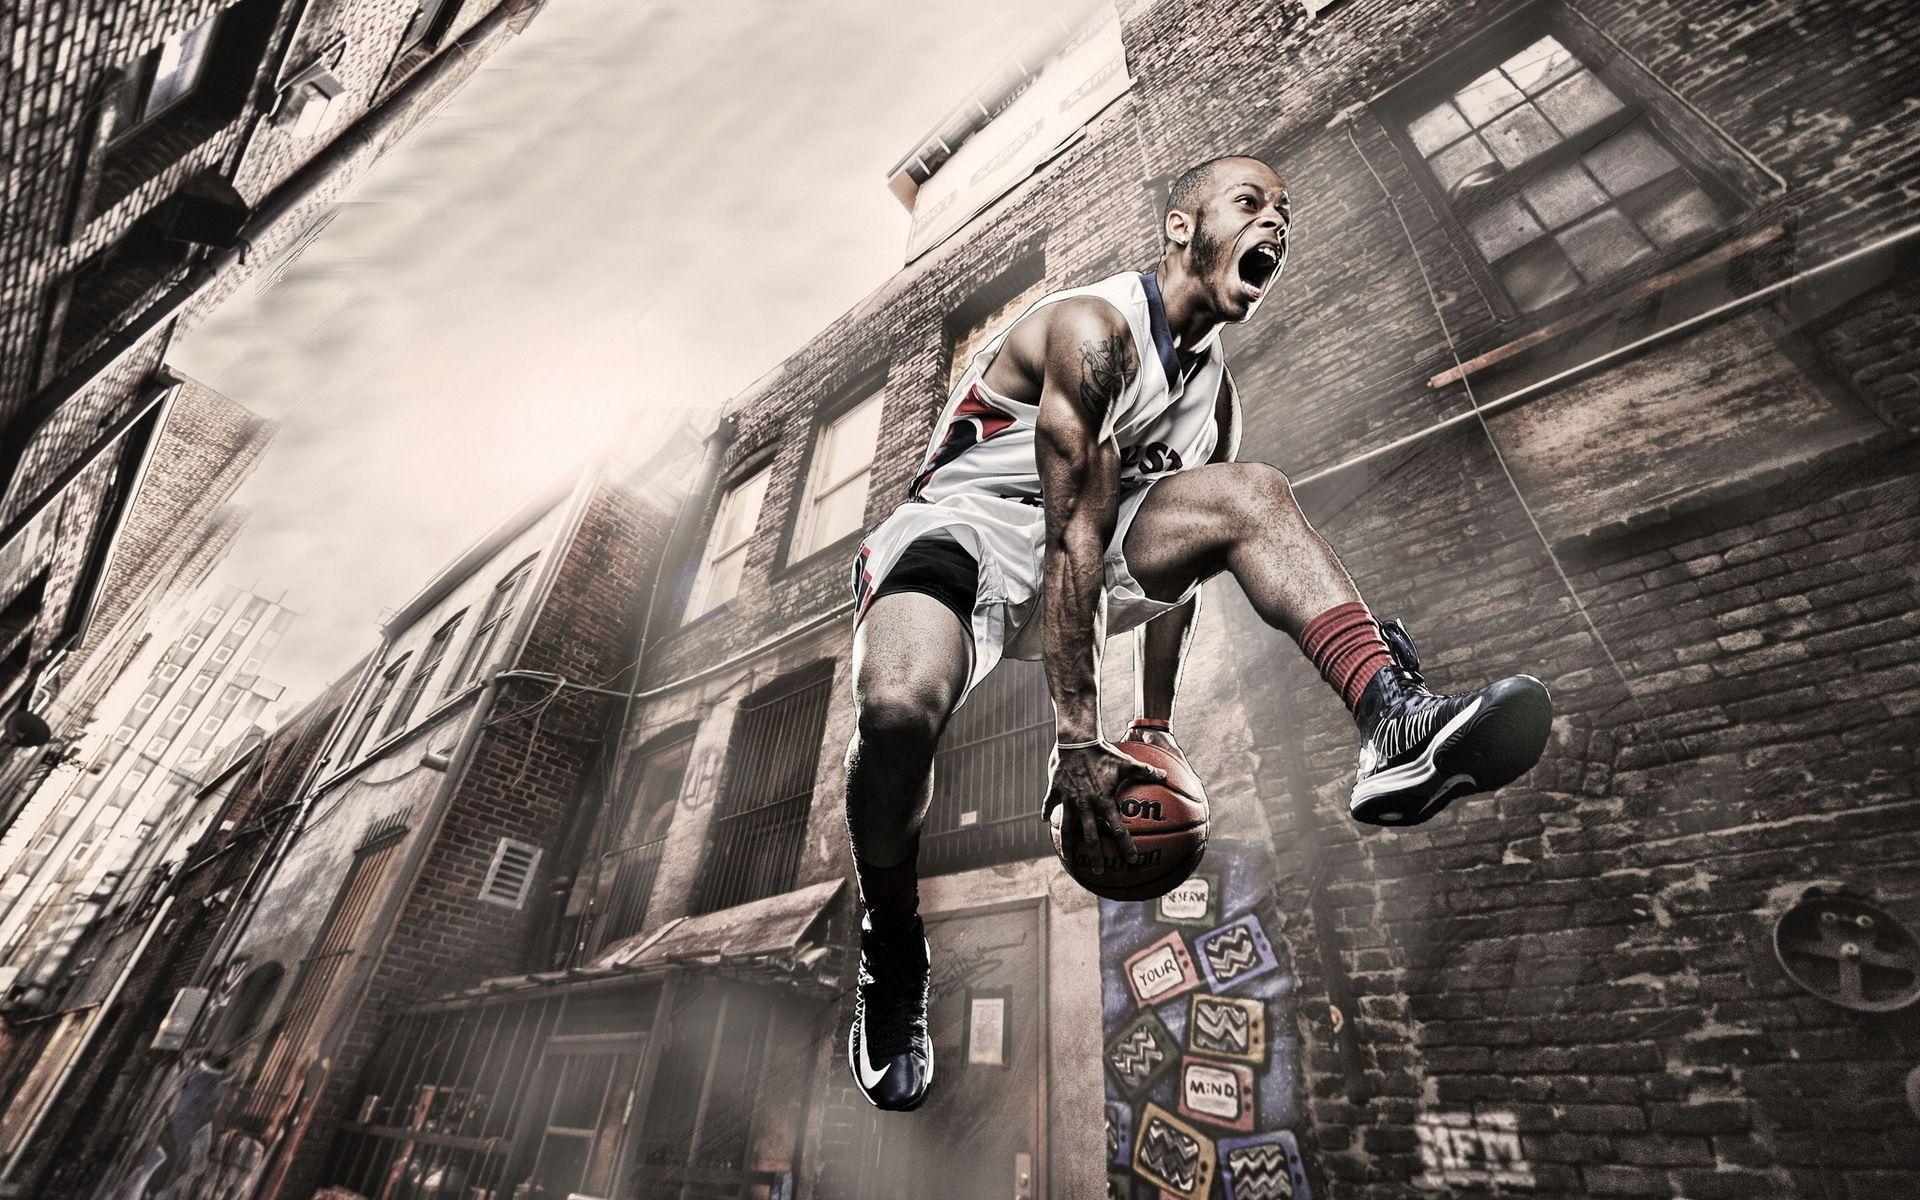 Nba Basketball Wallpapers 2017 - Wallpaper Cave